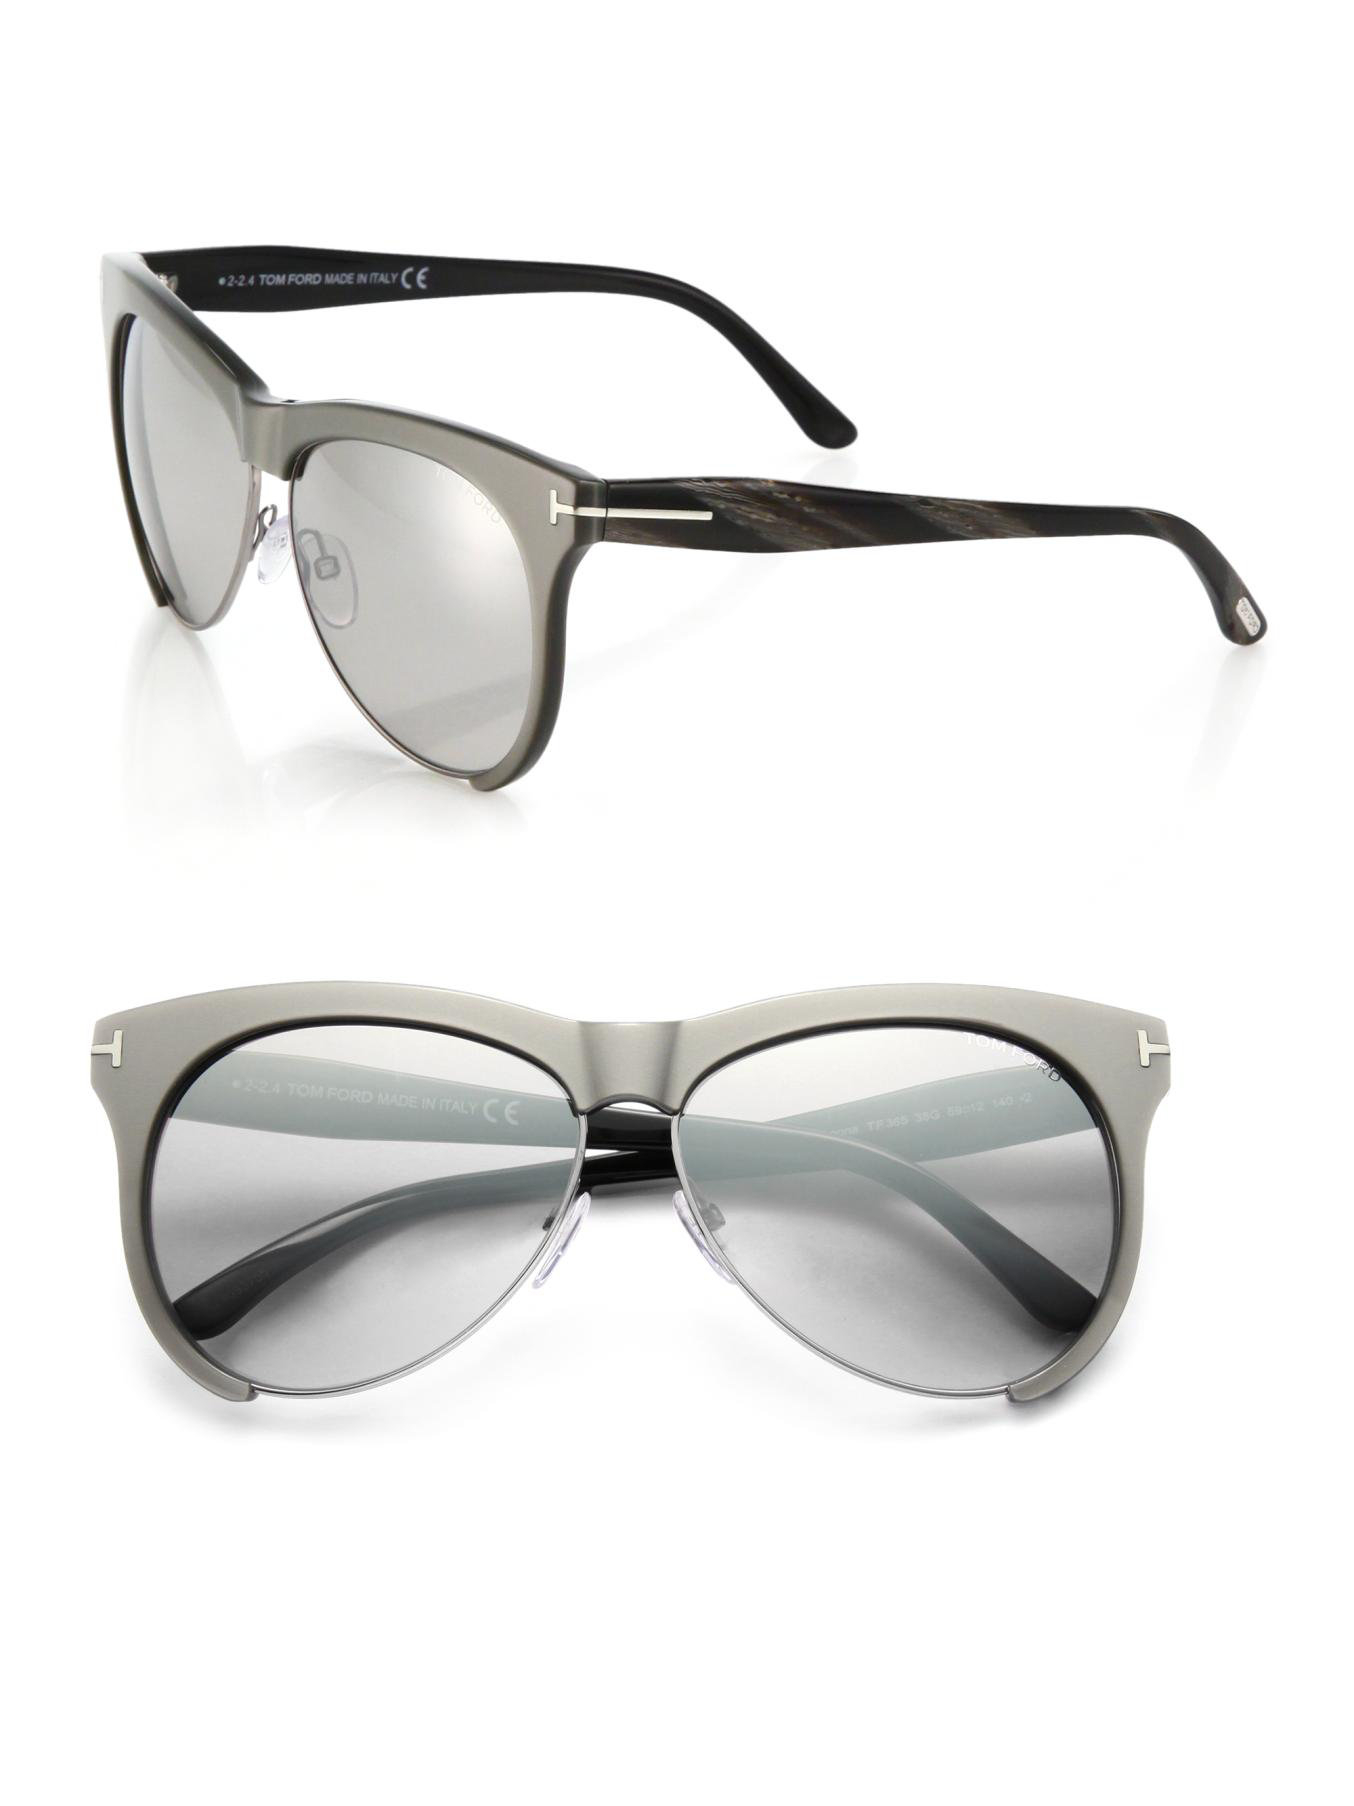 5ca37398e671 Jimmy Choo Waldes Aviator Sunglasses